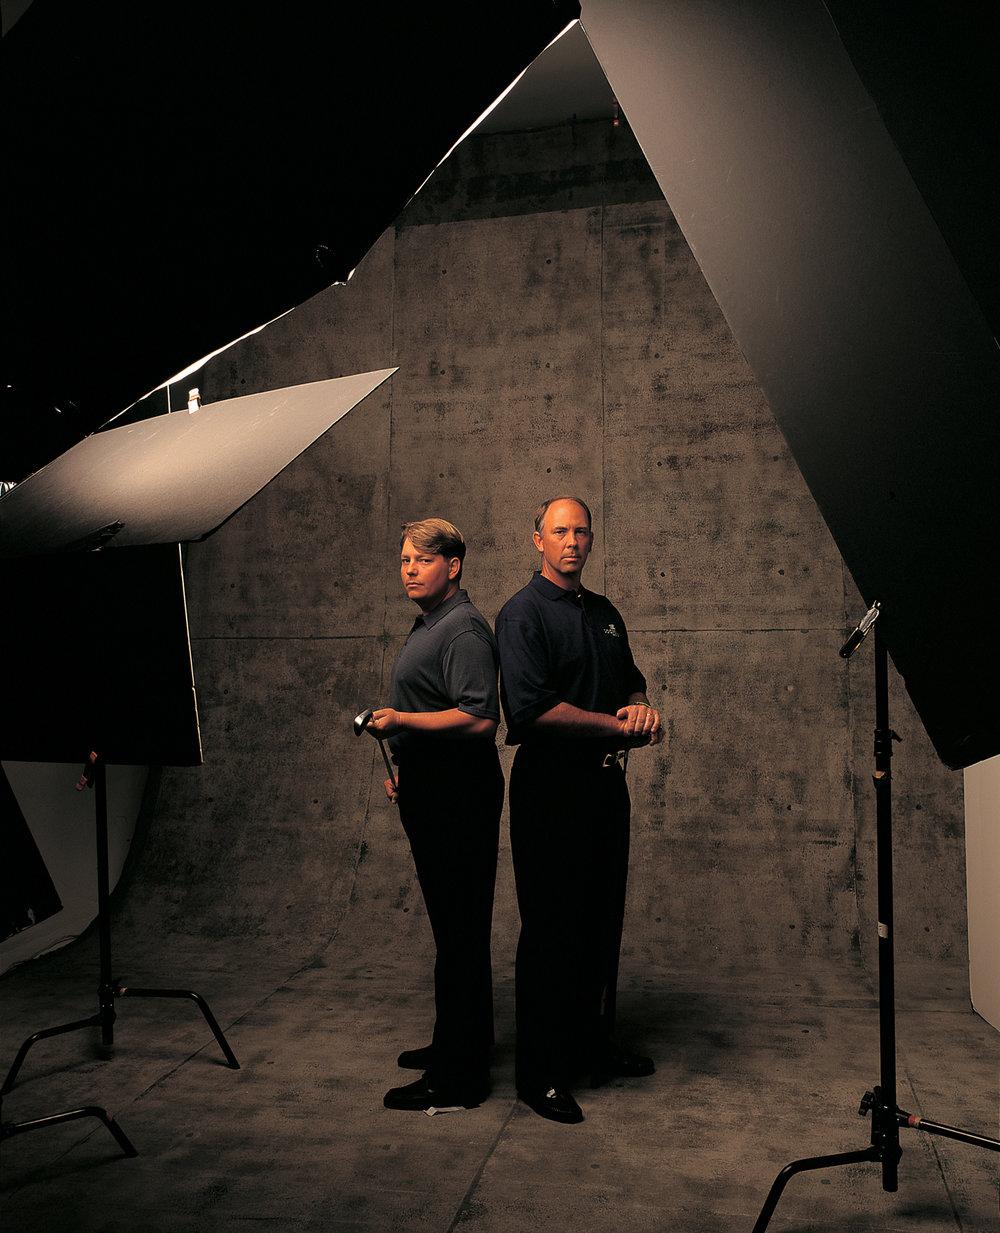 Tim Herron & Tom Lehman, 2000